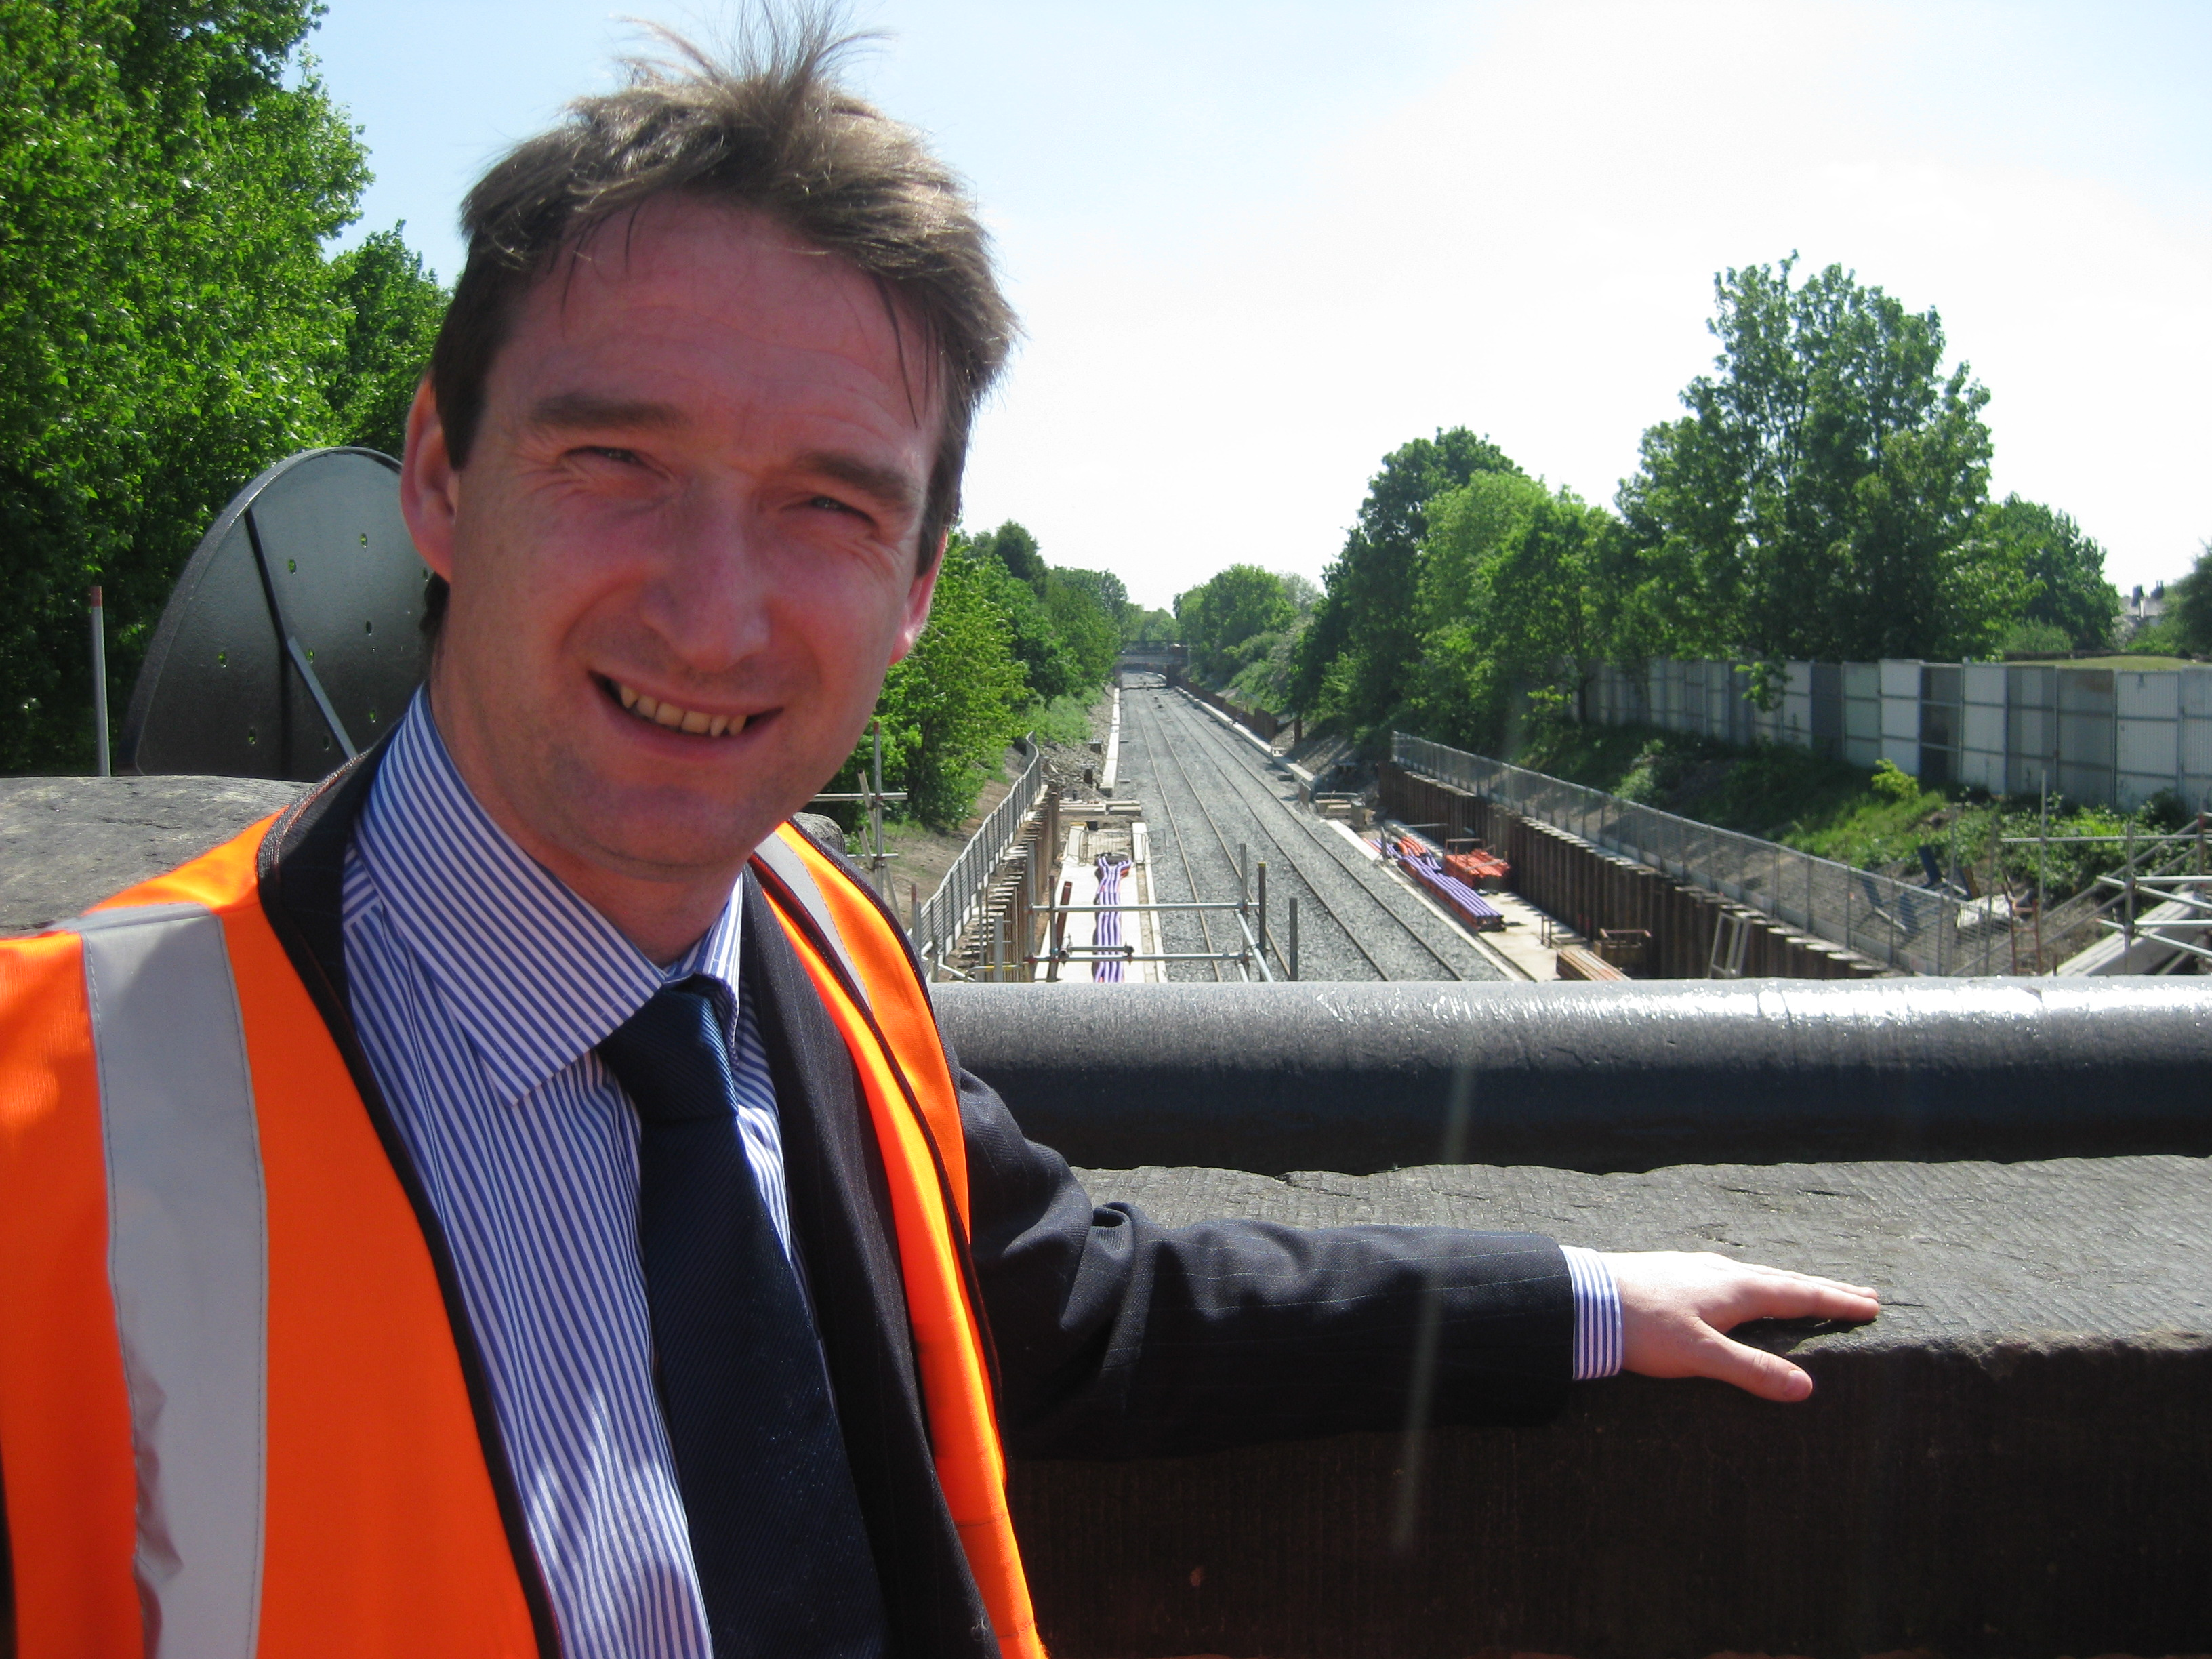 John_Leech_Metrolink_Chorlton_line.JPG